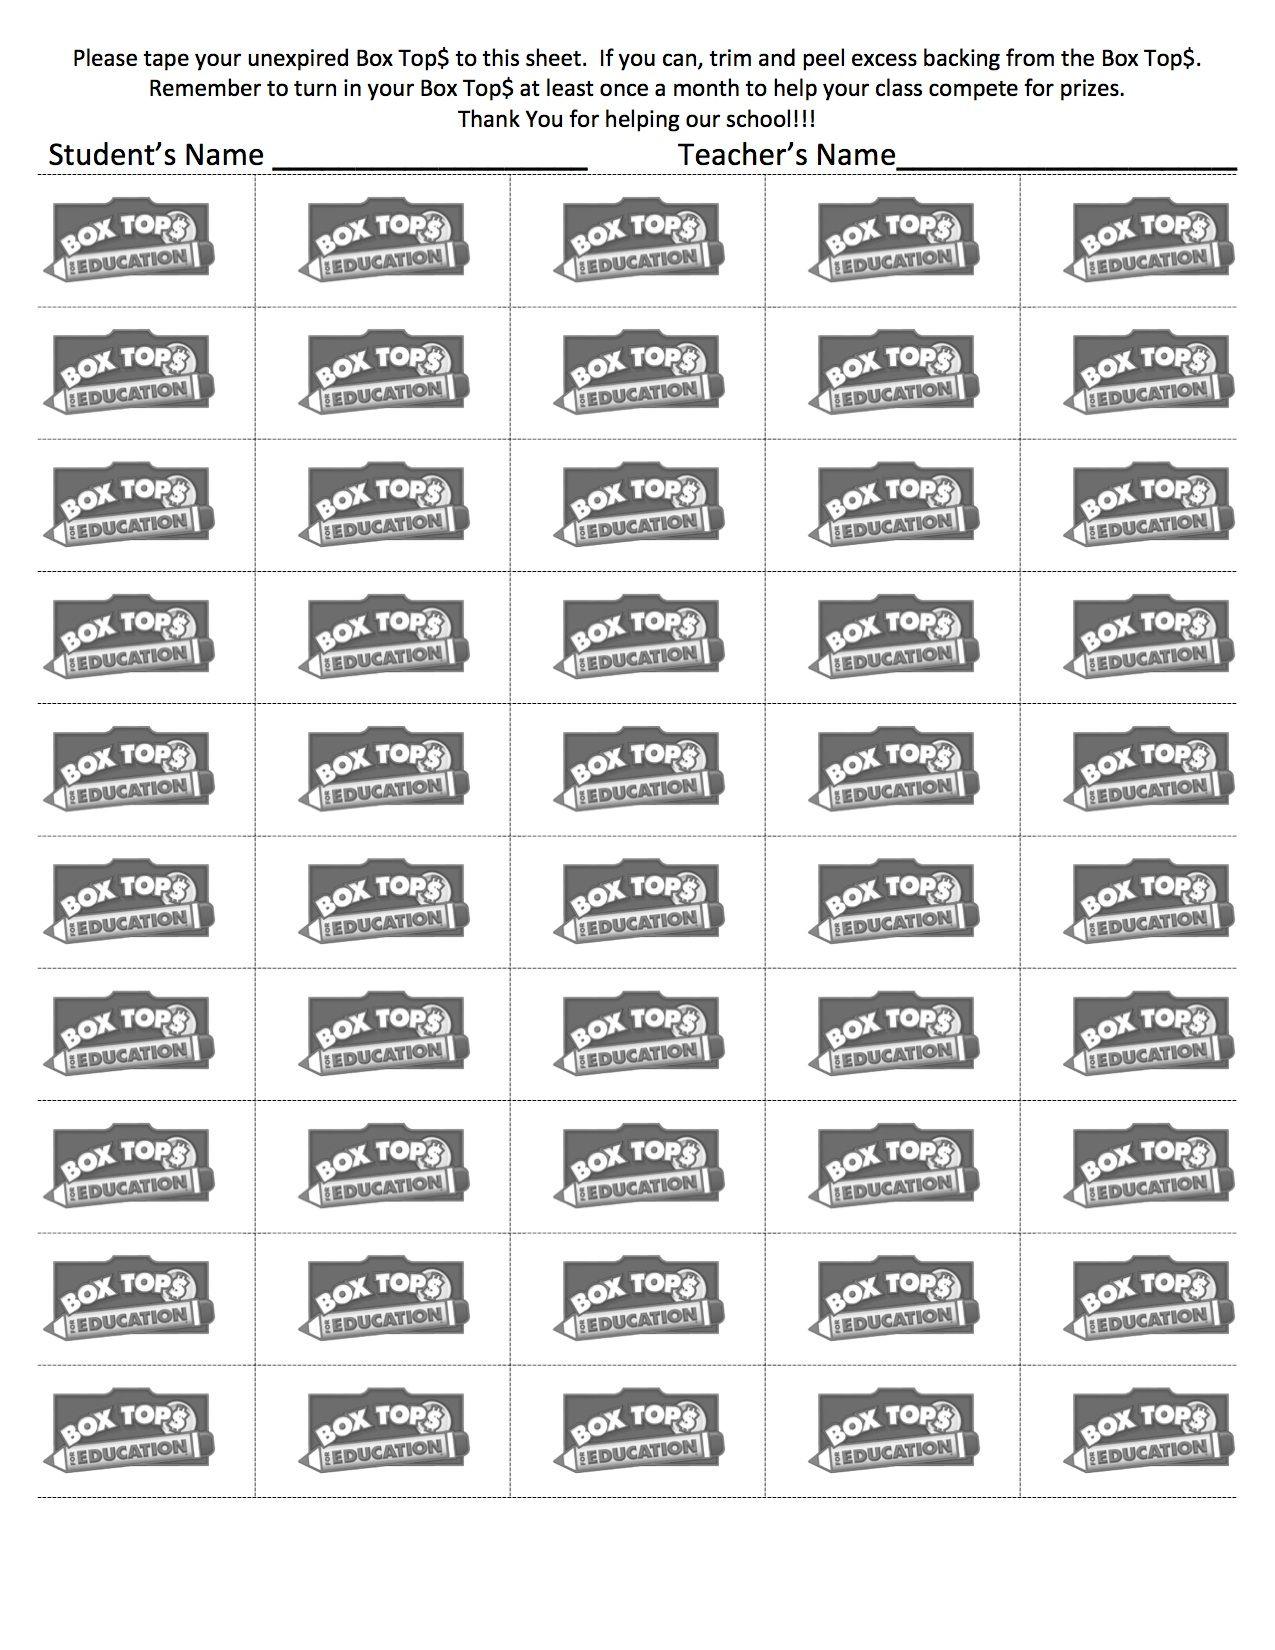 Box Tops 50 Count Sheet